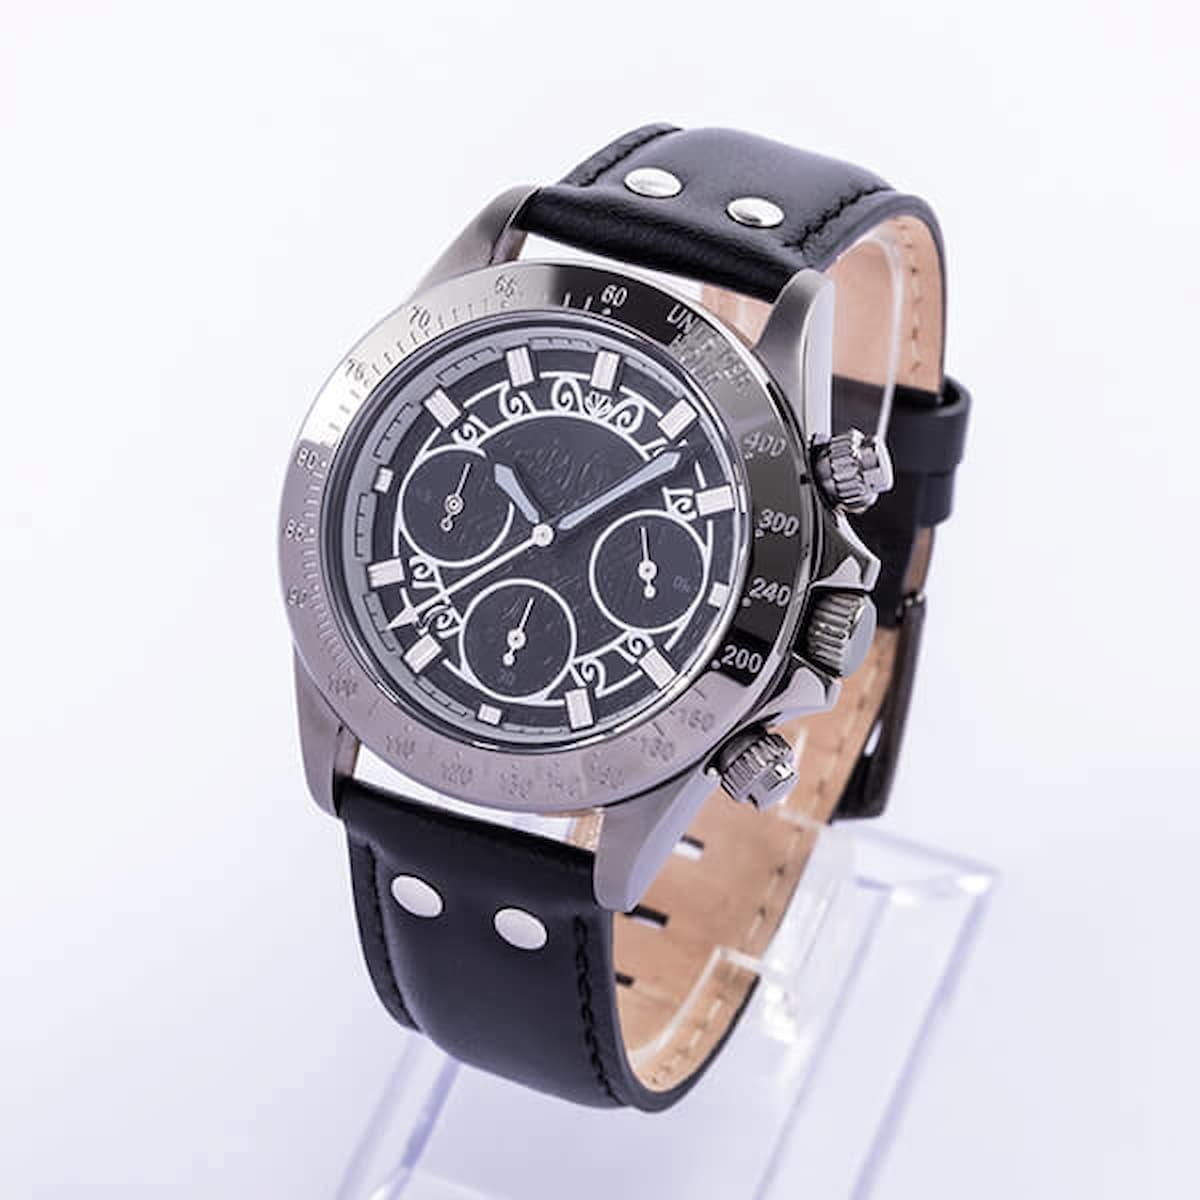 「NieR Replicant」腕時計<主人公モデル>